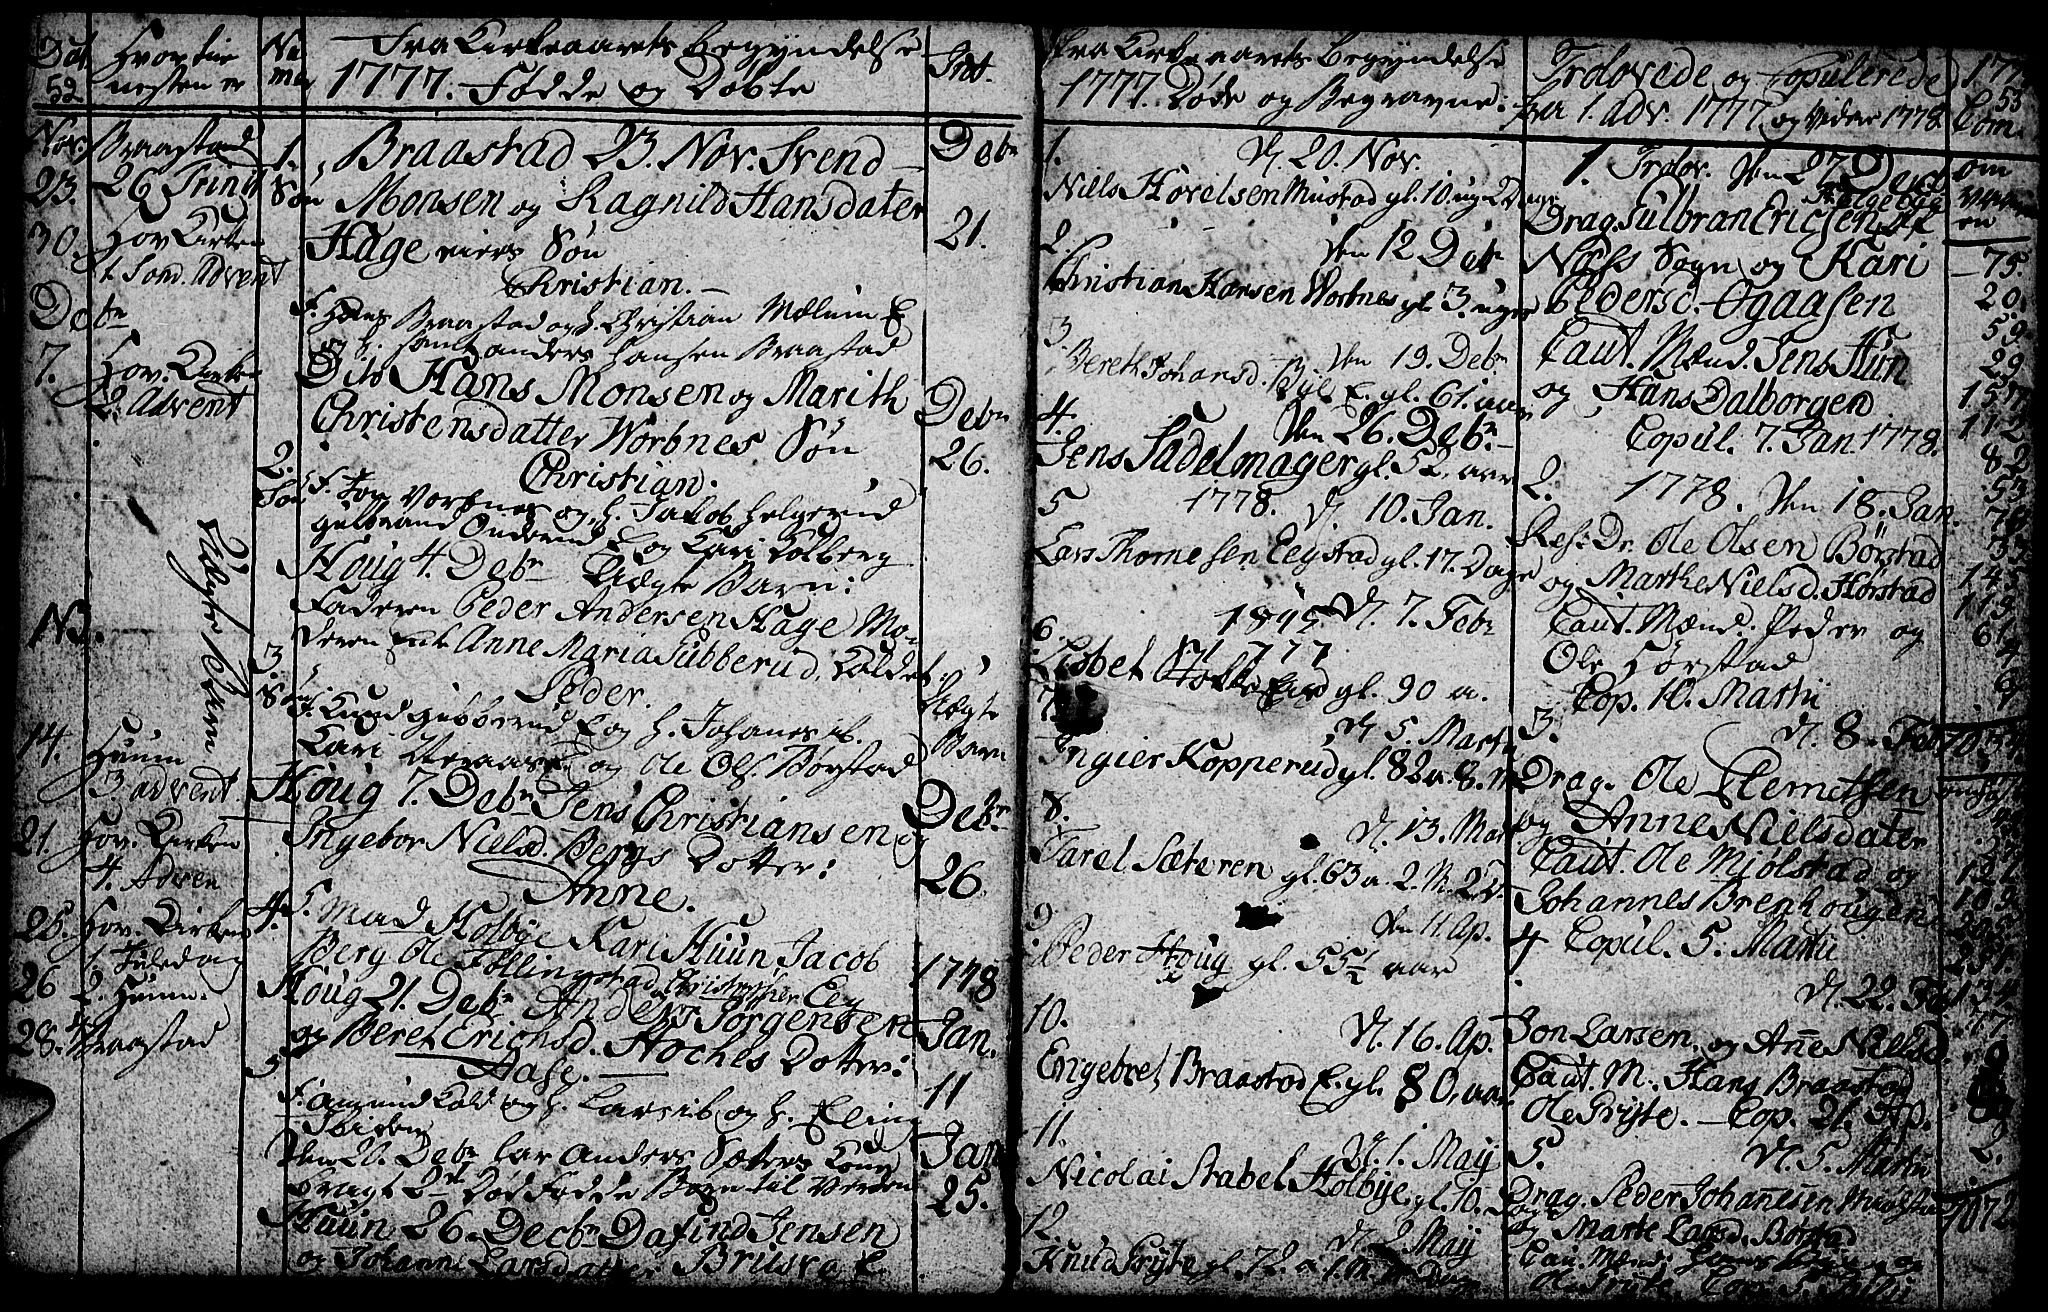 SAH, Vardal prestekontor, H/Ha/Hab/L0001: Klokkerbok nr. 1, 1771-1790, s. 52-53